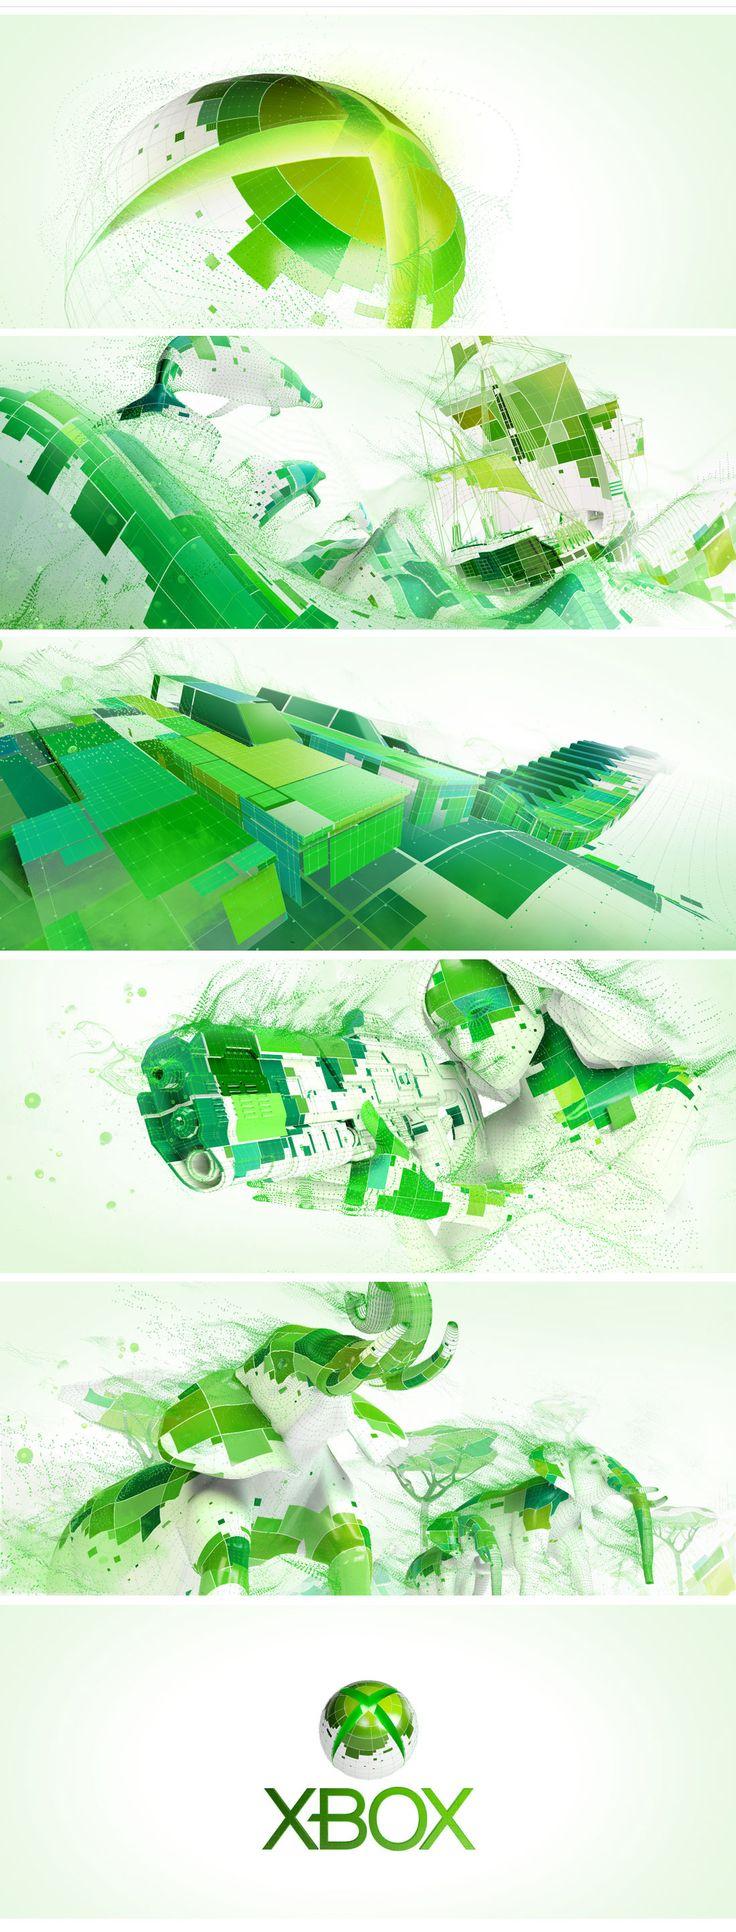 motion graphics/ storyboards/ styleframes | XBOX - carlosstevens.com